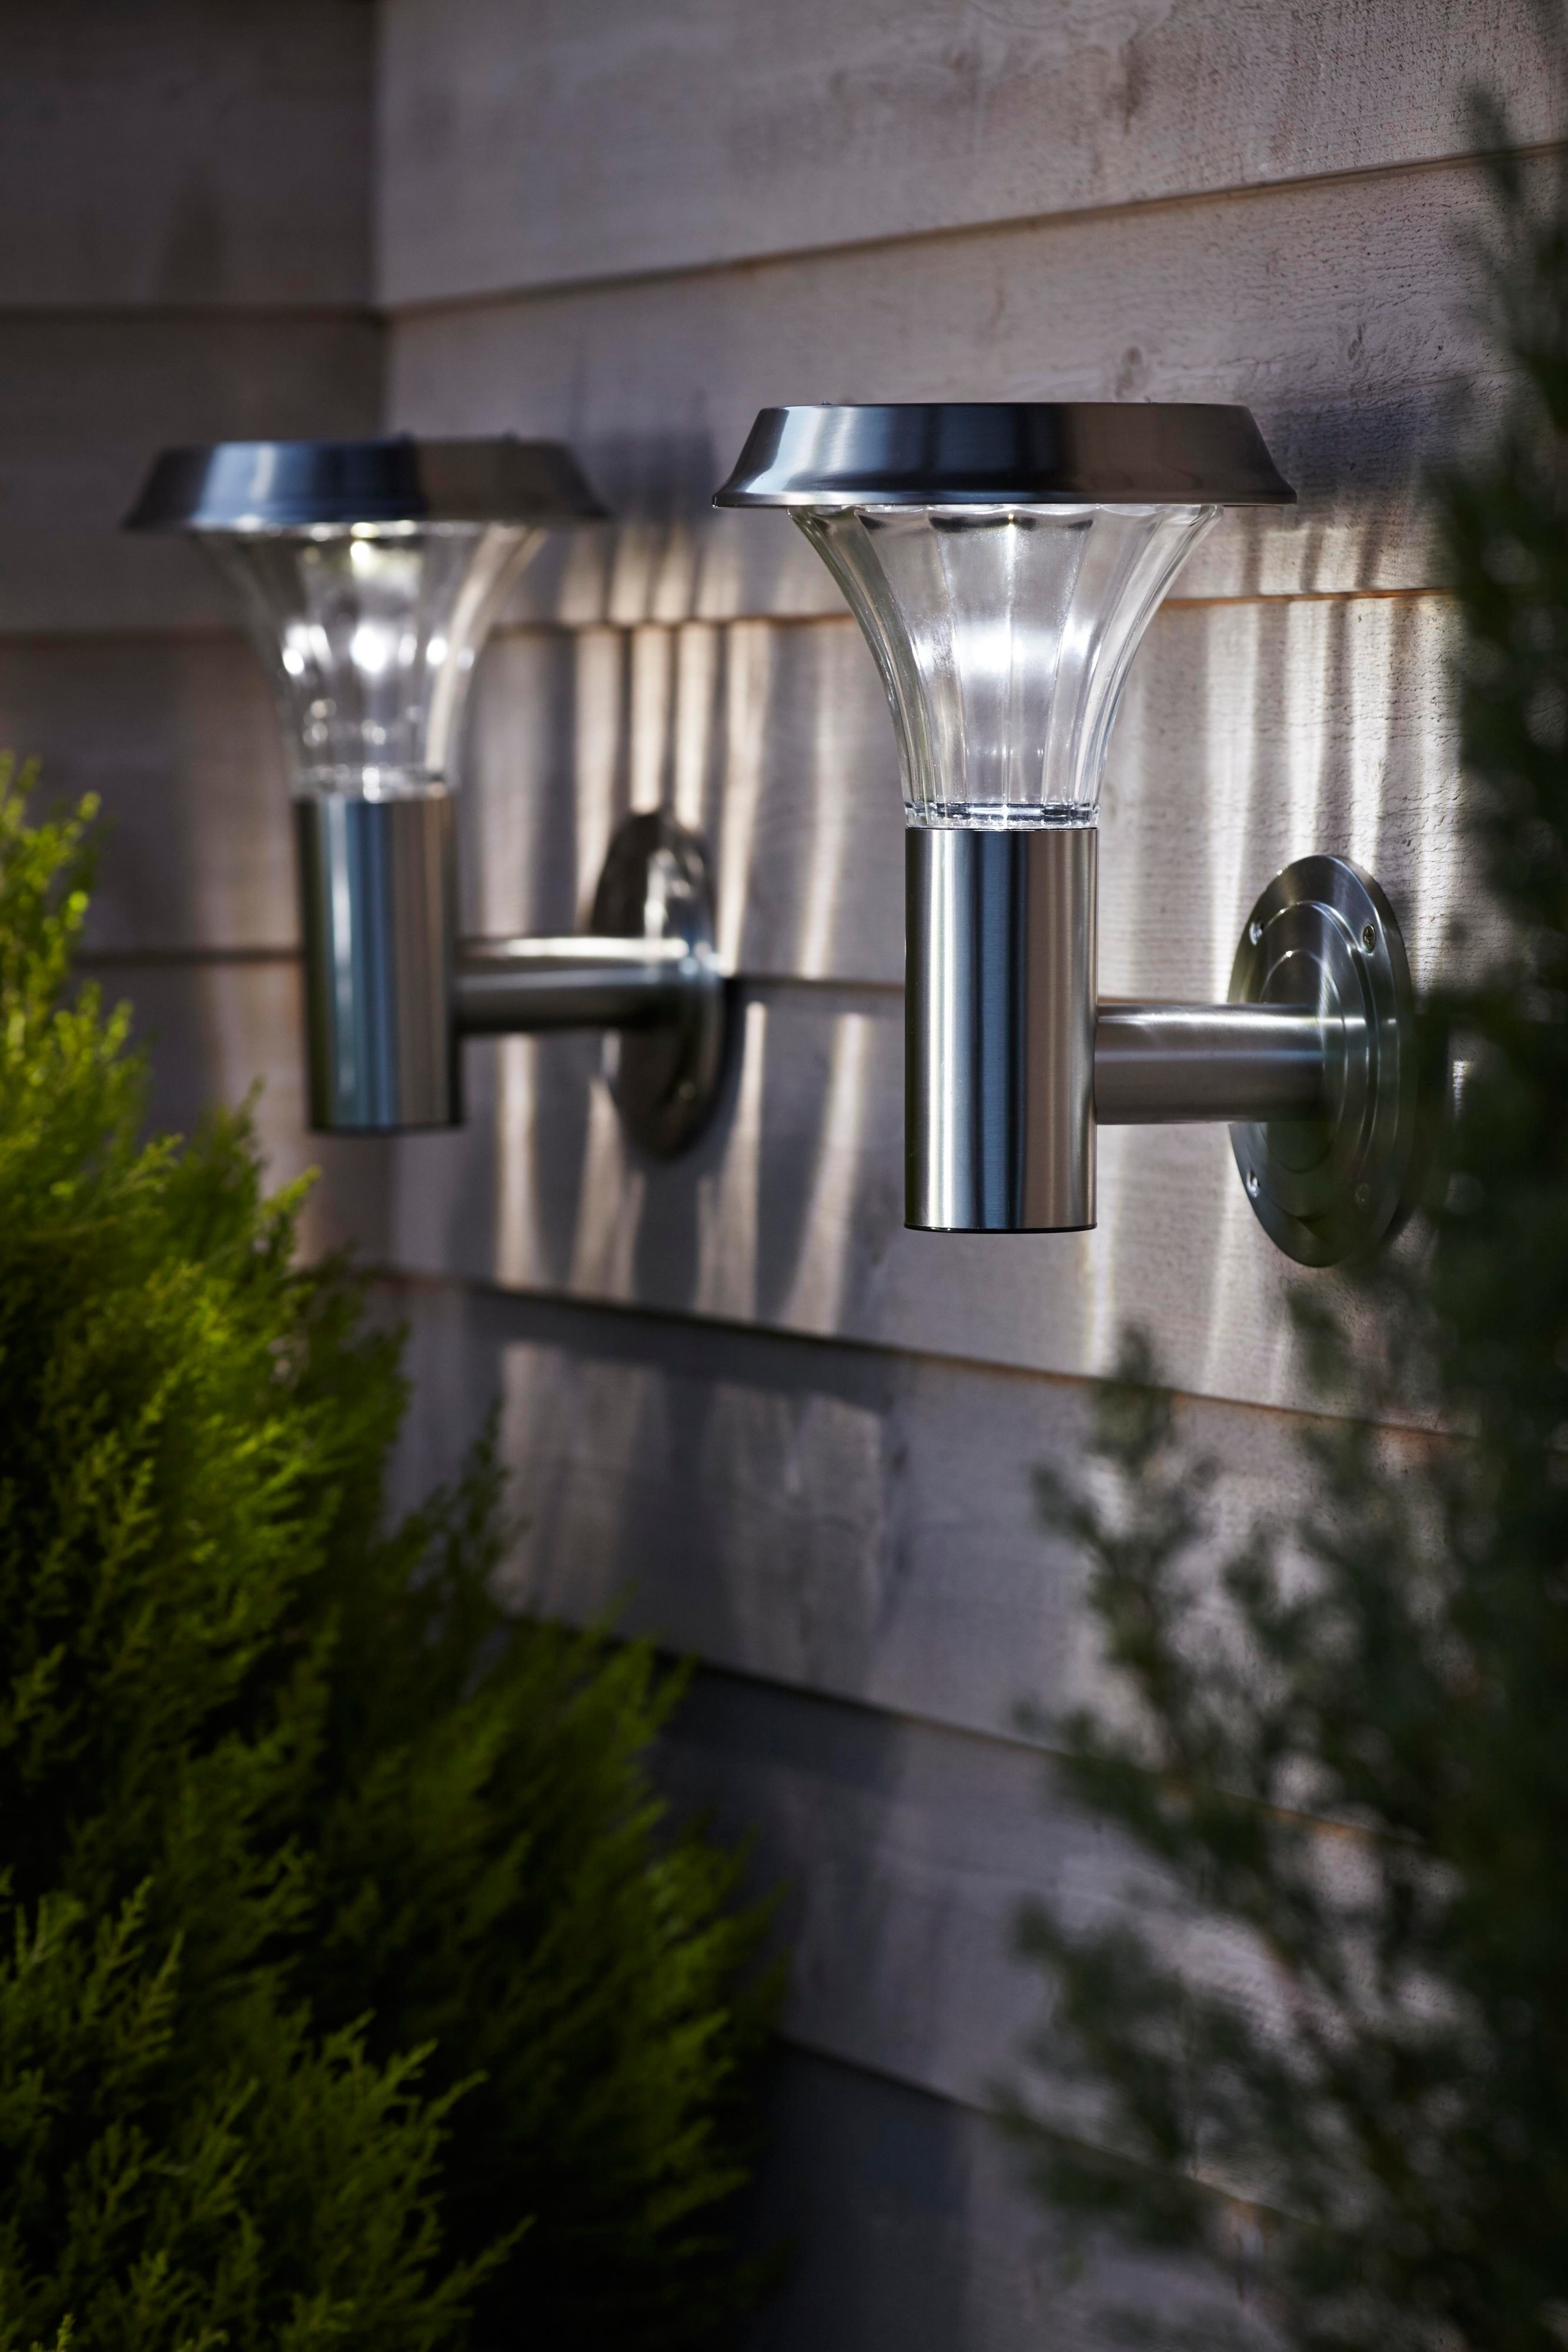 Outdoor Lighting Garden Solar Lights ~ Idolza Intended For Contemporary Solar Garden Lighting Fixtures (#10 of 15)